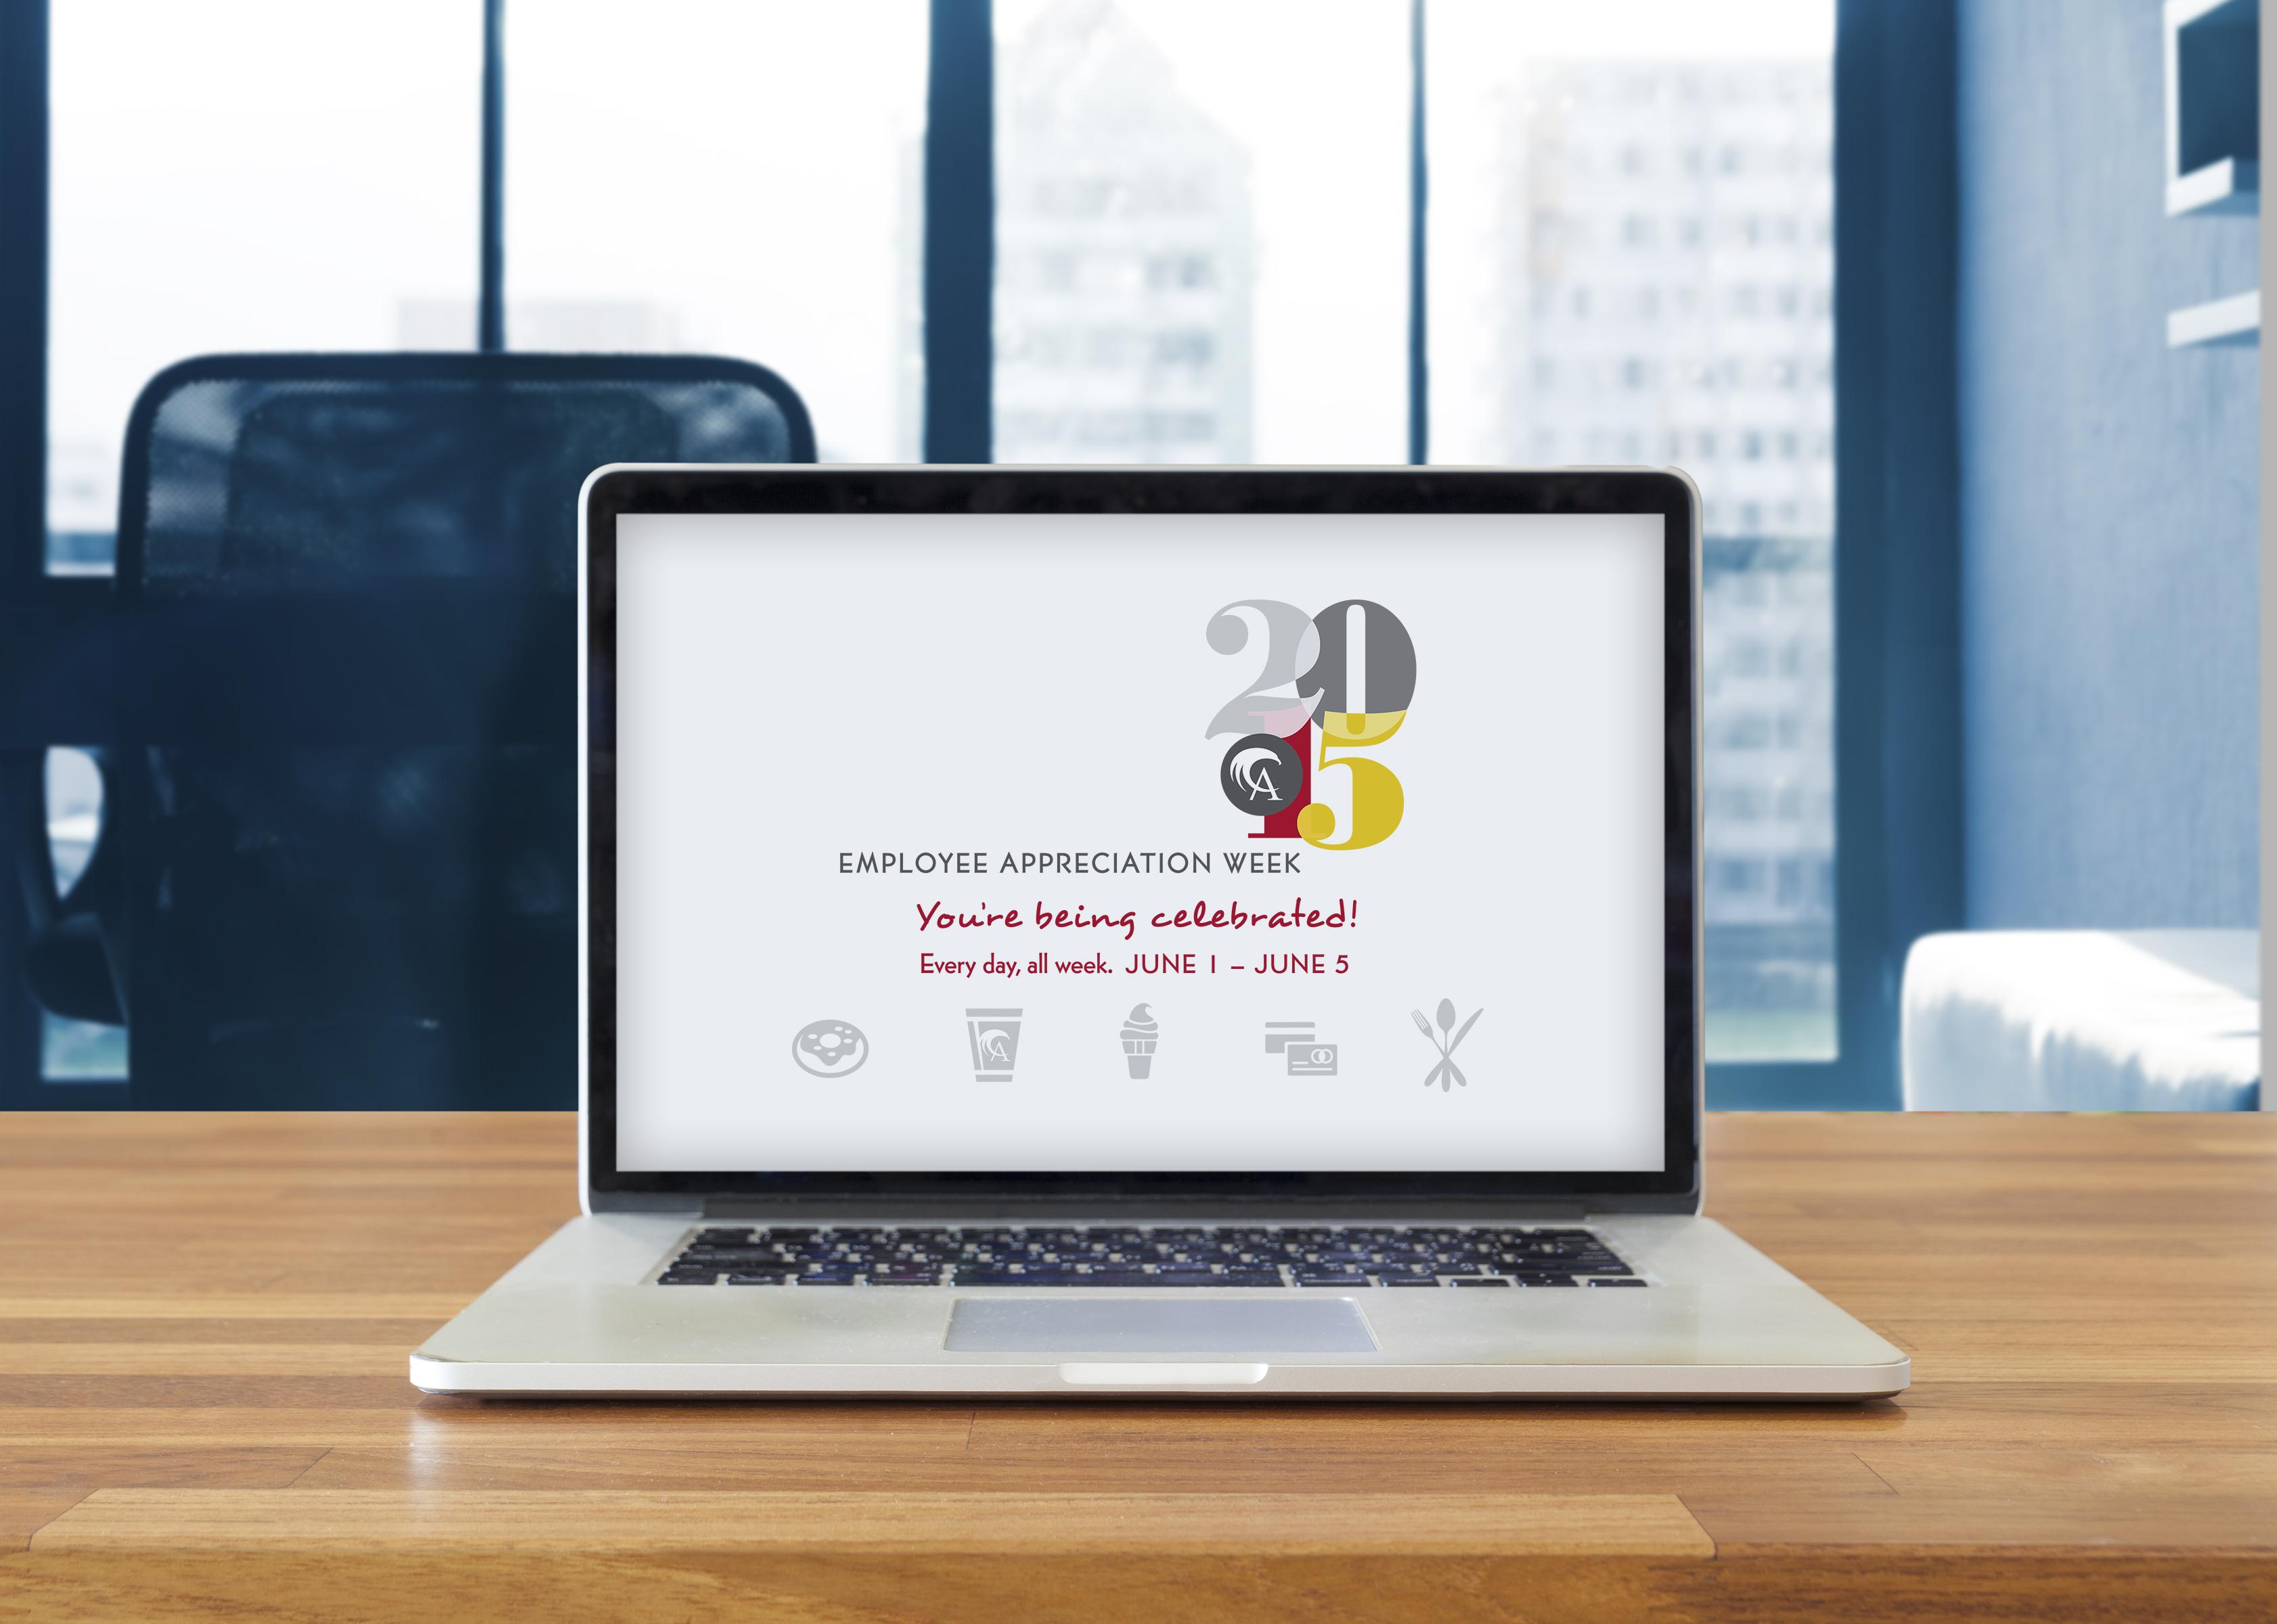 Employee Appreciation Week Desktop Graphic